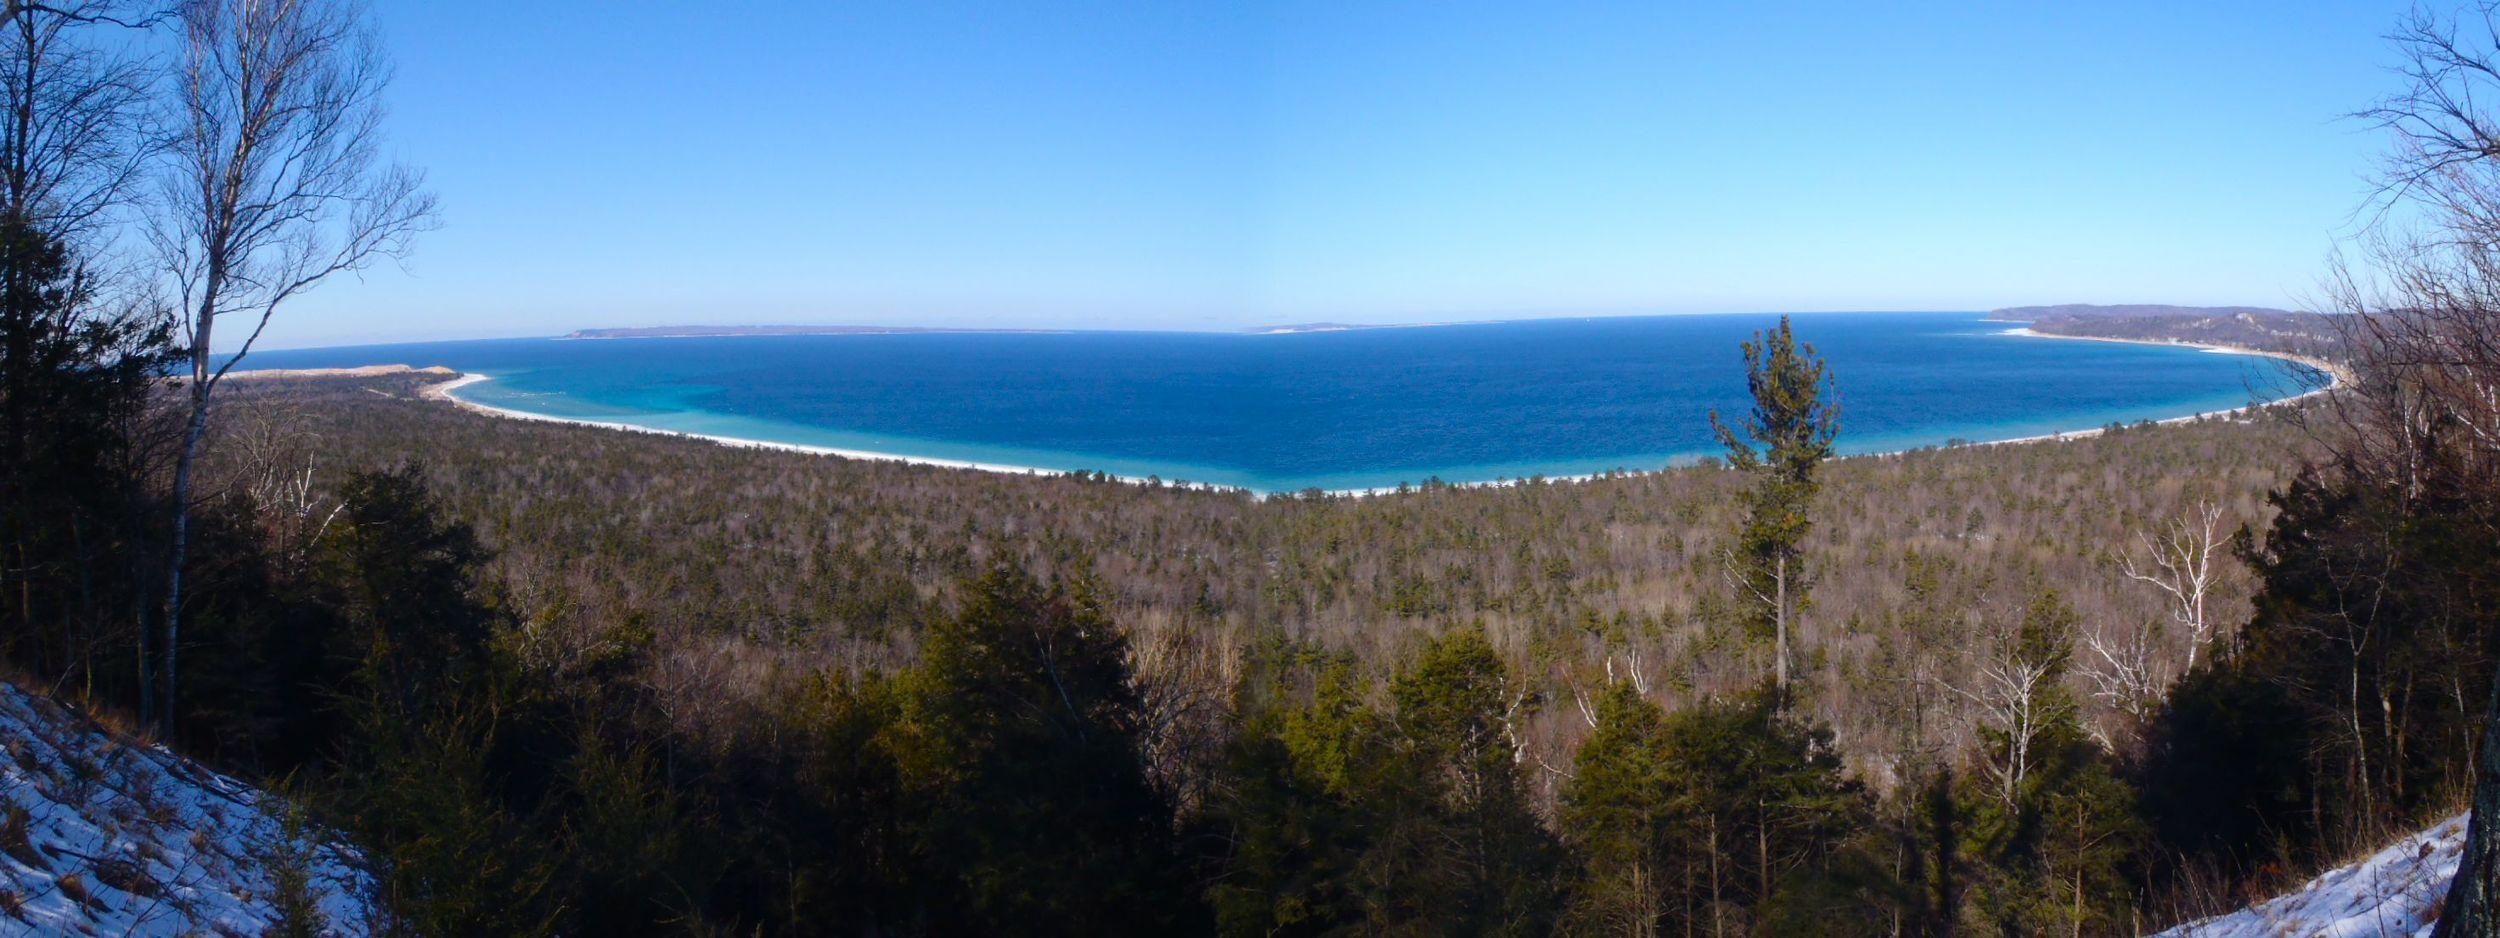 image of a view of lake michigan